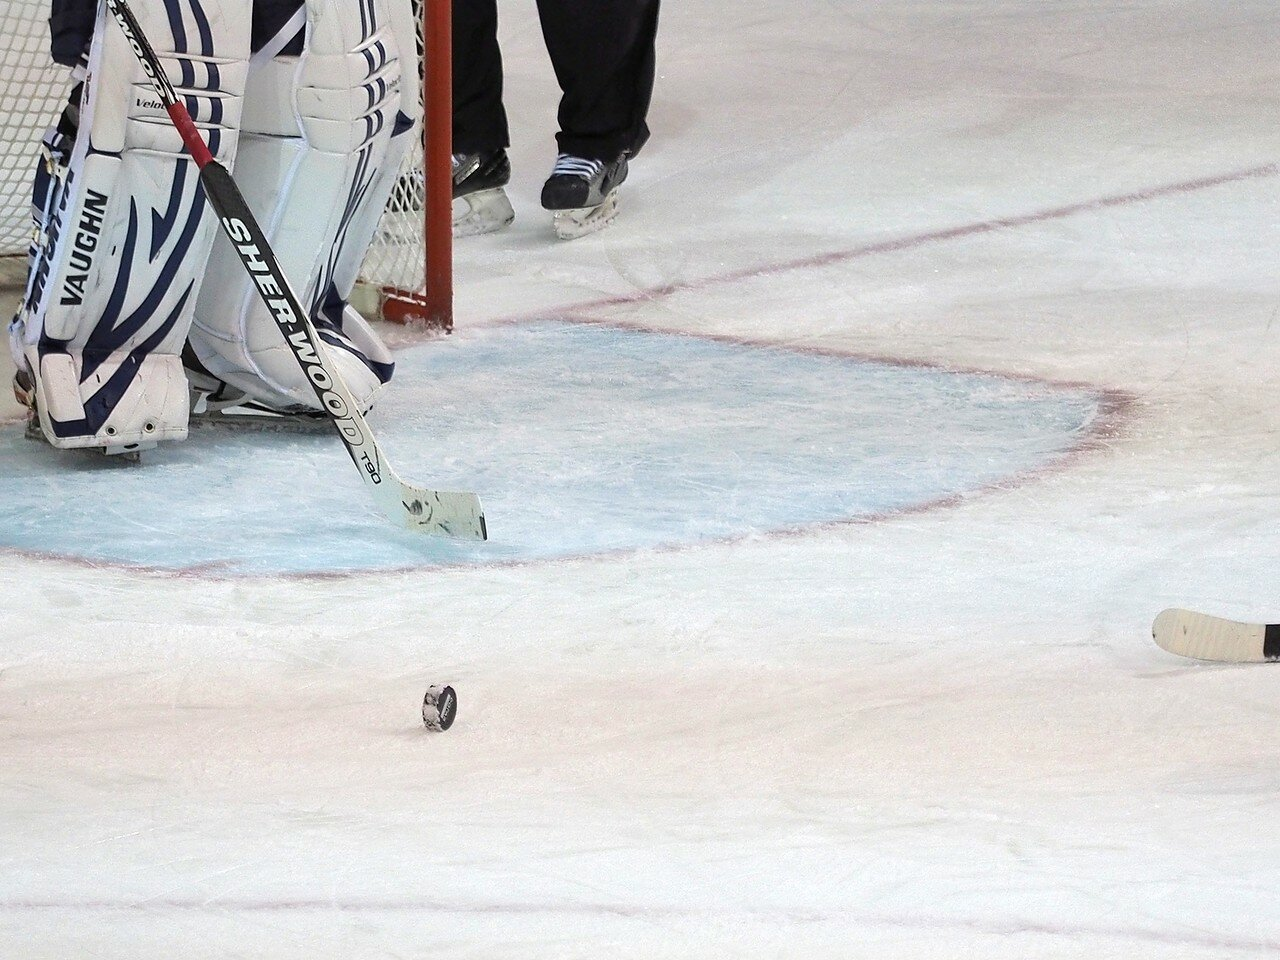 97Восток 1/2 плей-офф Металлург - Сибирь 08.03.2016